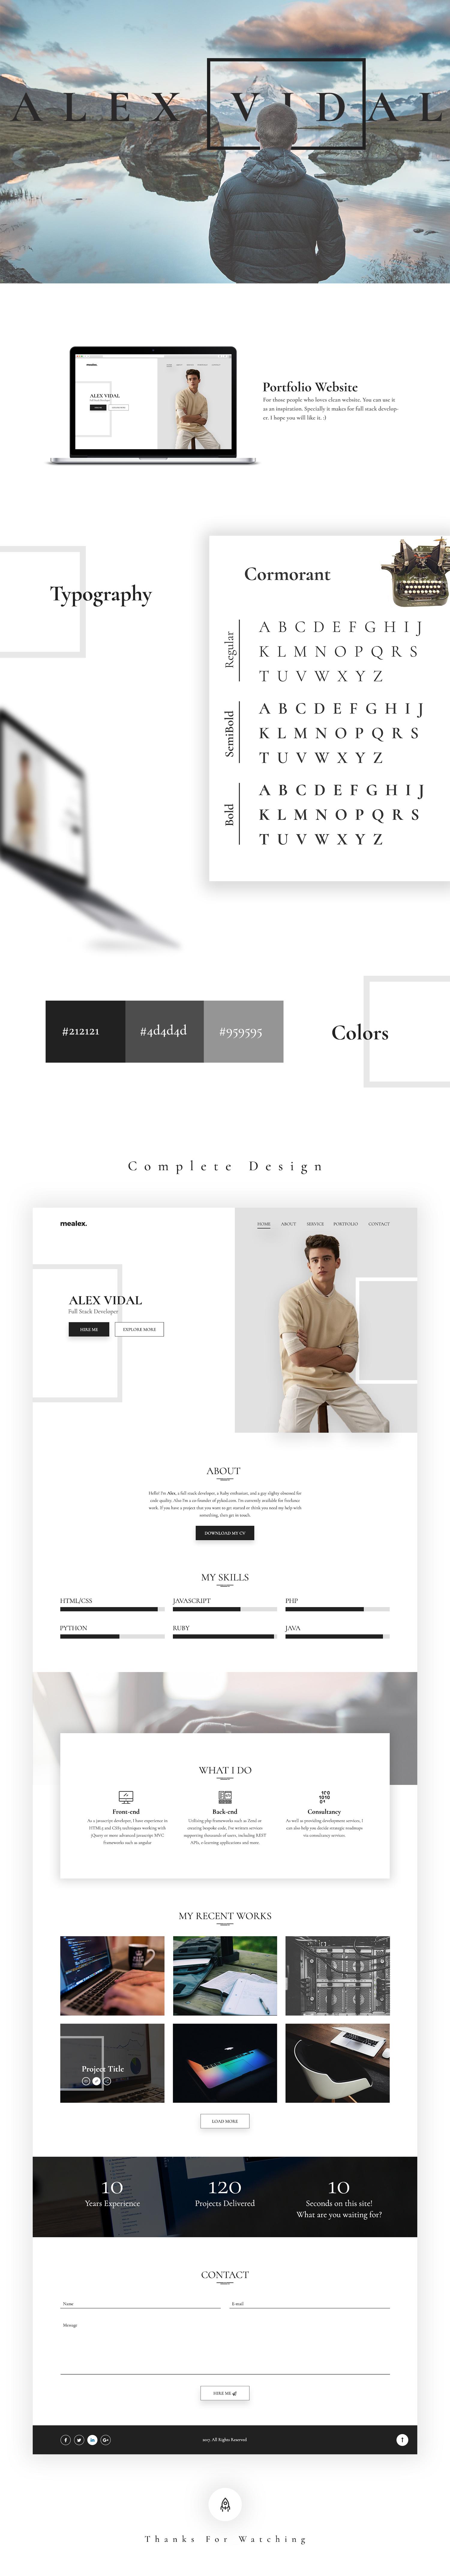 alex free personal portfolio and resume psd template uideck. Black Bedroom Furniture Sets. Home Design Ideas